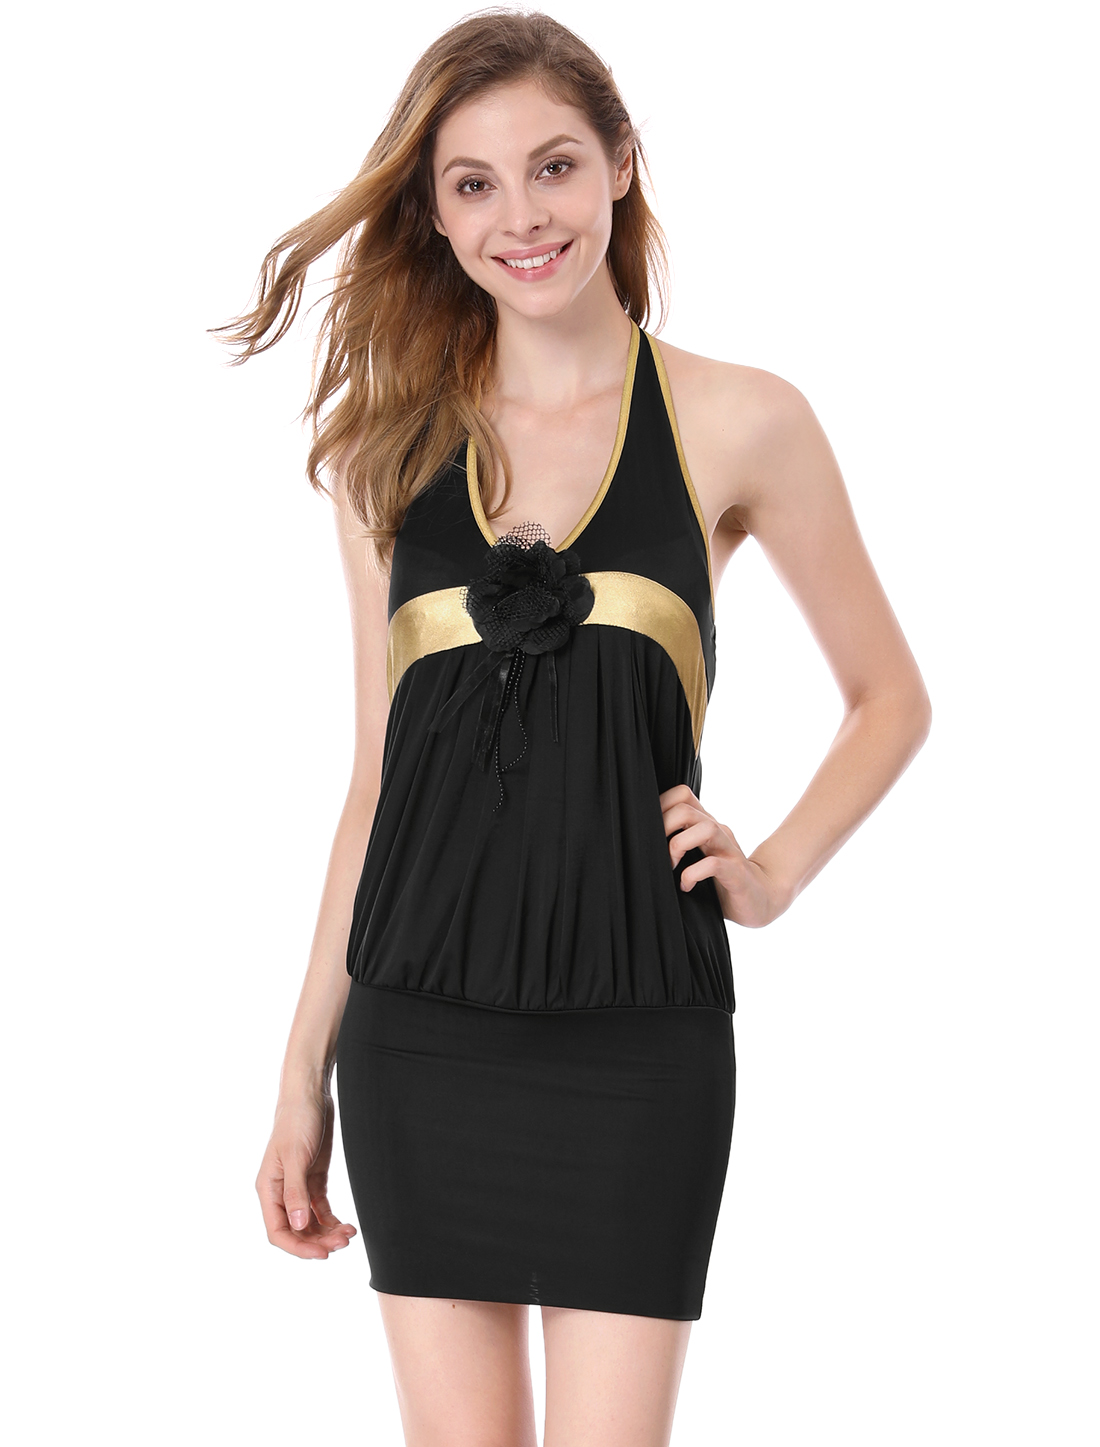 Pullover Chic Corsage Decor Front Black Clubwear Mini Dress XL for Lady